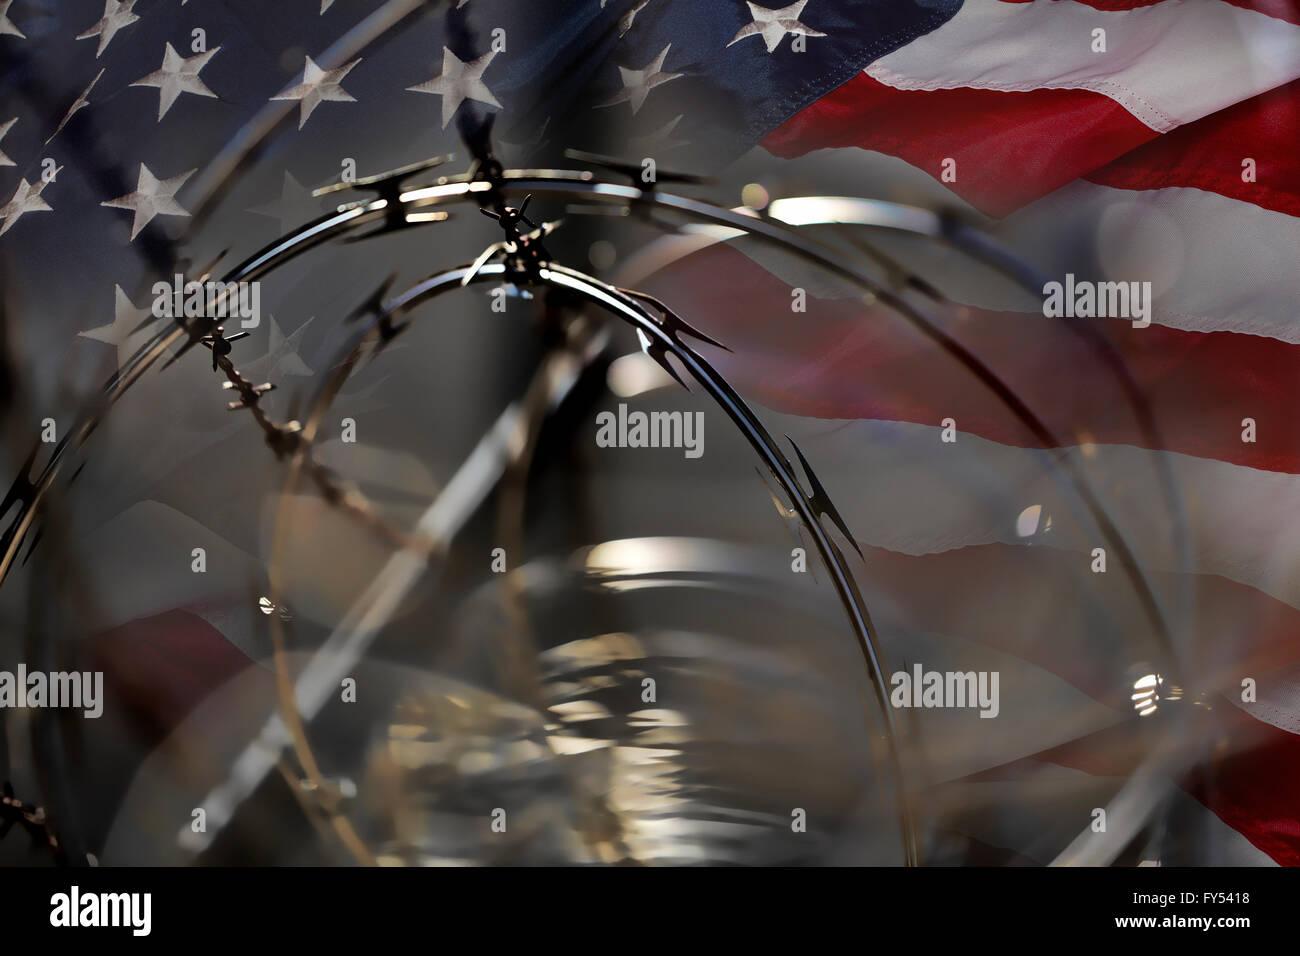 USA-Grenze Zaun Stacheldraht Razor und amerikanische Flagge ...